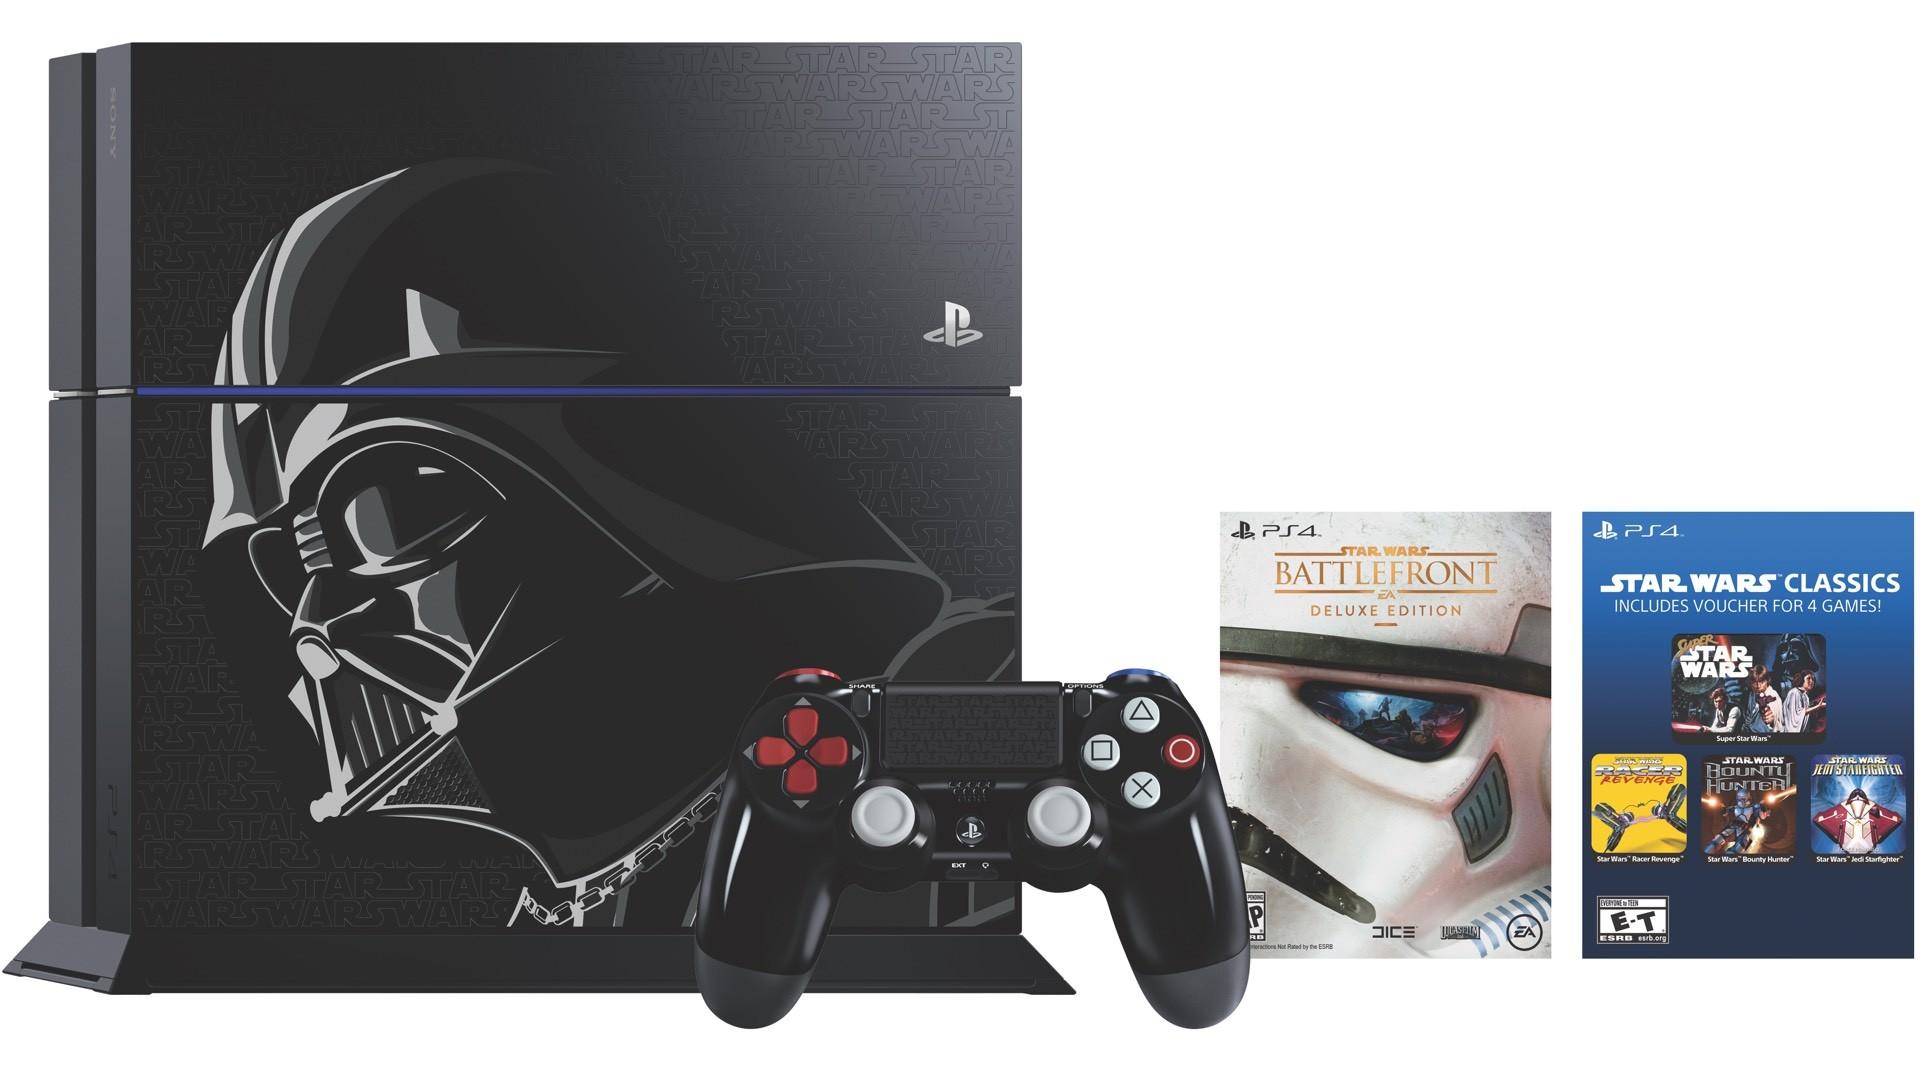 Star Wars Battlefront Playstation 4 Bundle Also Has Standard Edition 500 Gb Drive